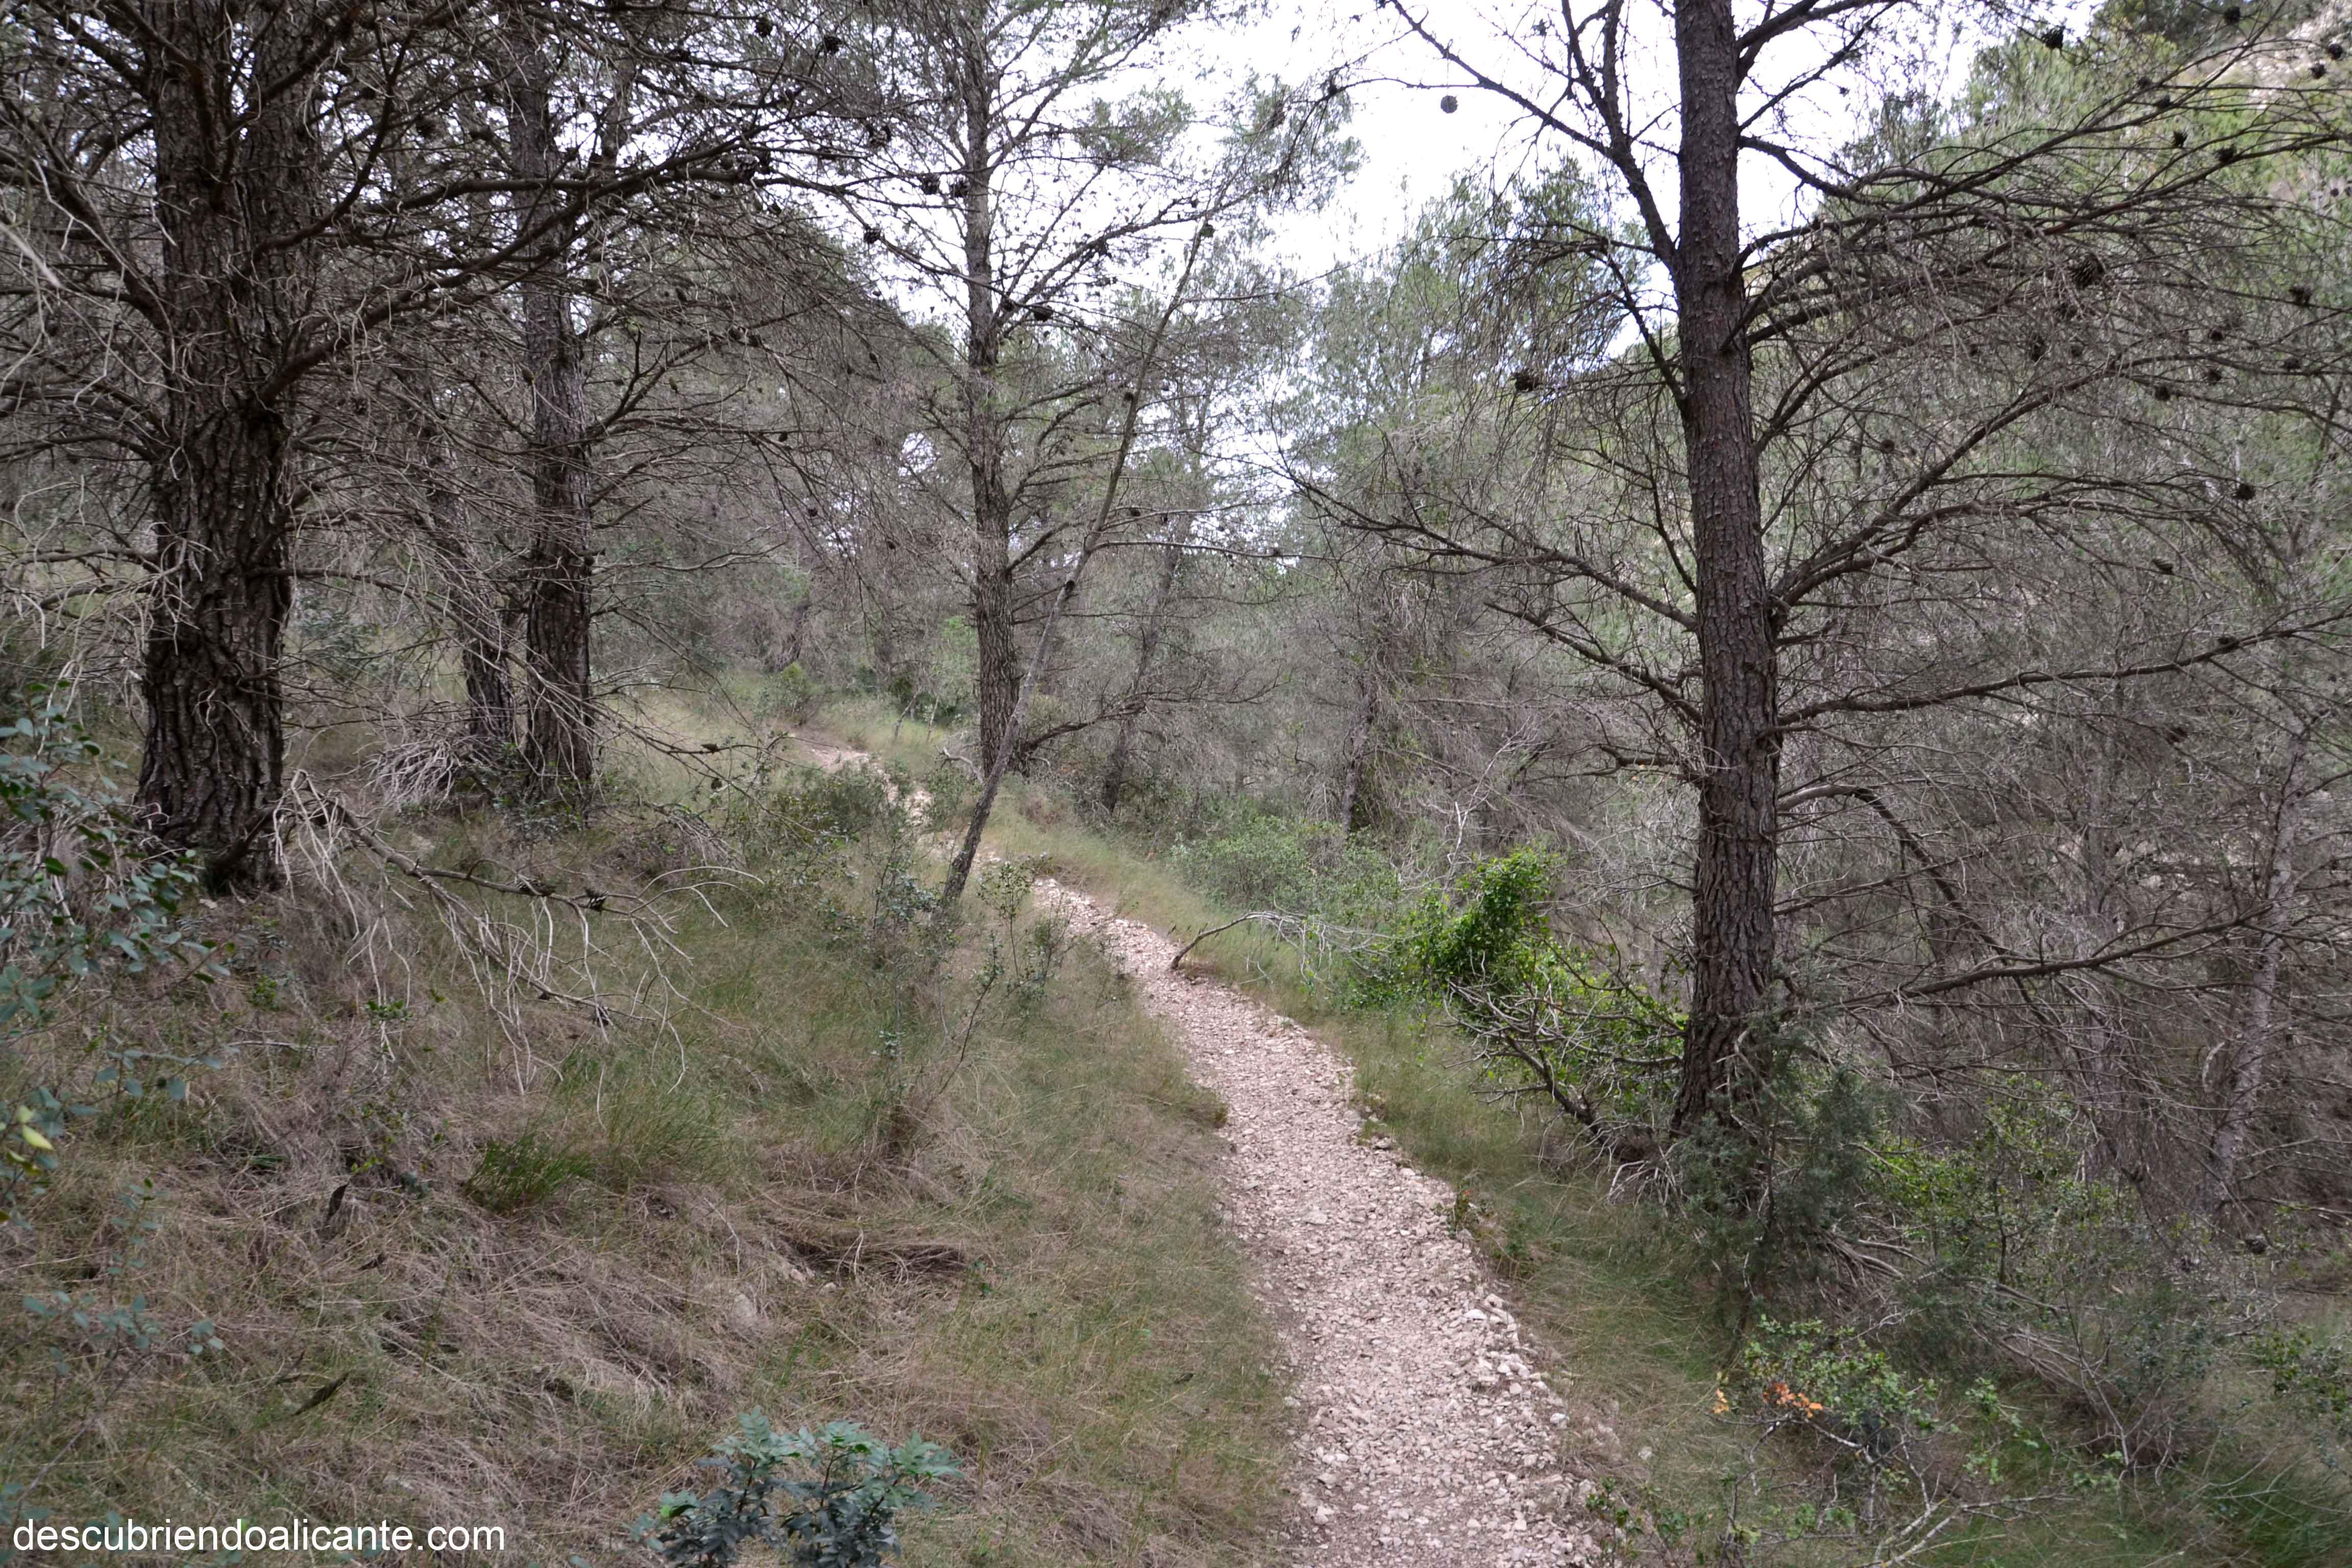 ruta-a-la-vella-sierra-de-crevillente